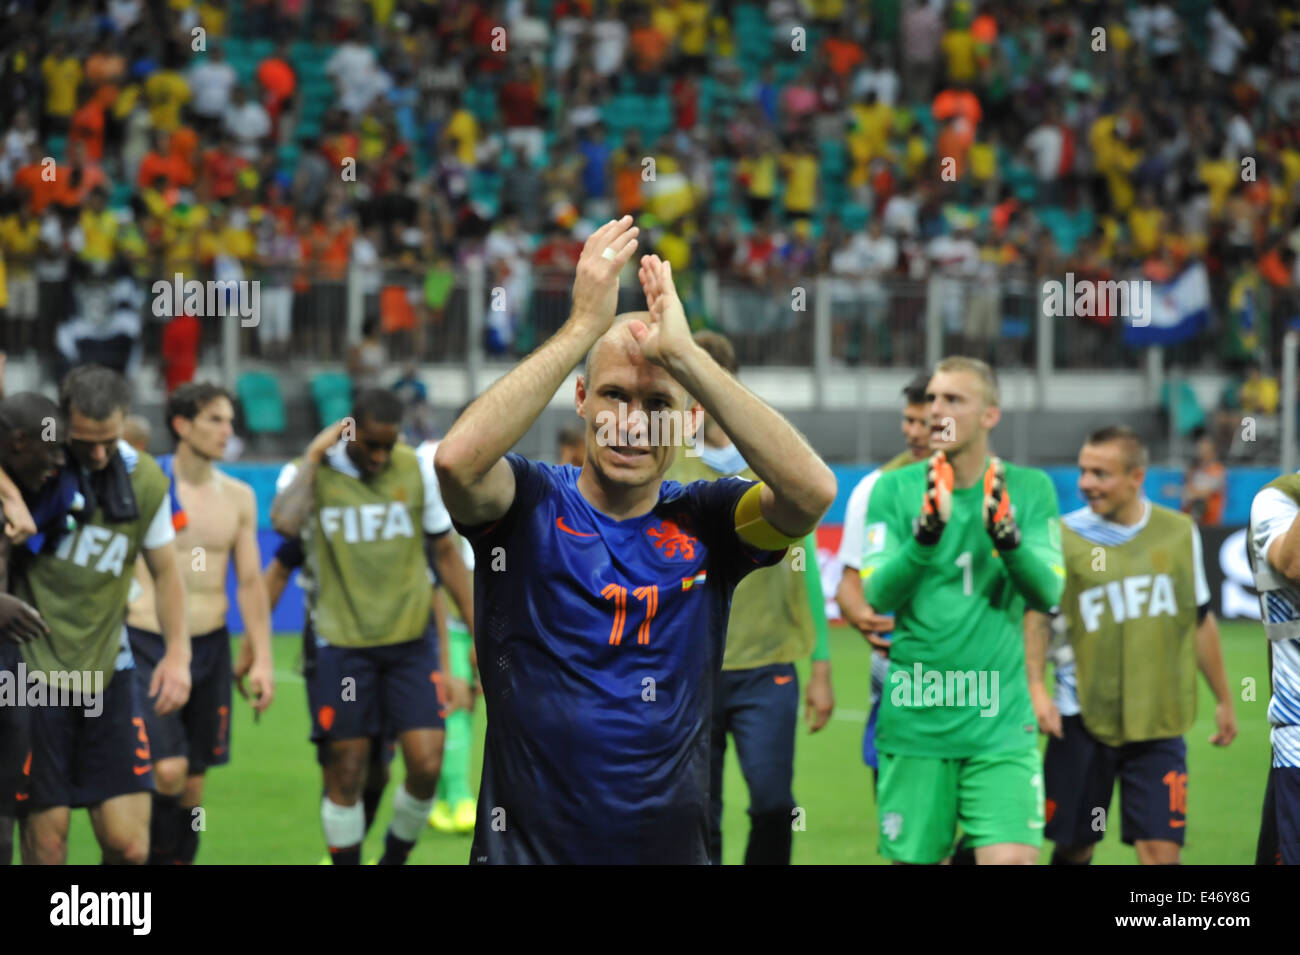 WM 2014, Salvador da Bahia, der zweifache Torschütze Arjen Robben nach dem Spiel, Holland vs. Spanien (5:1). - Stock Image